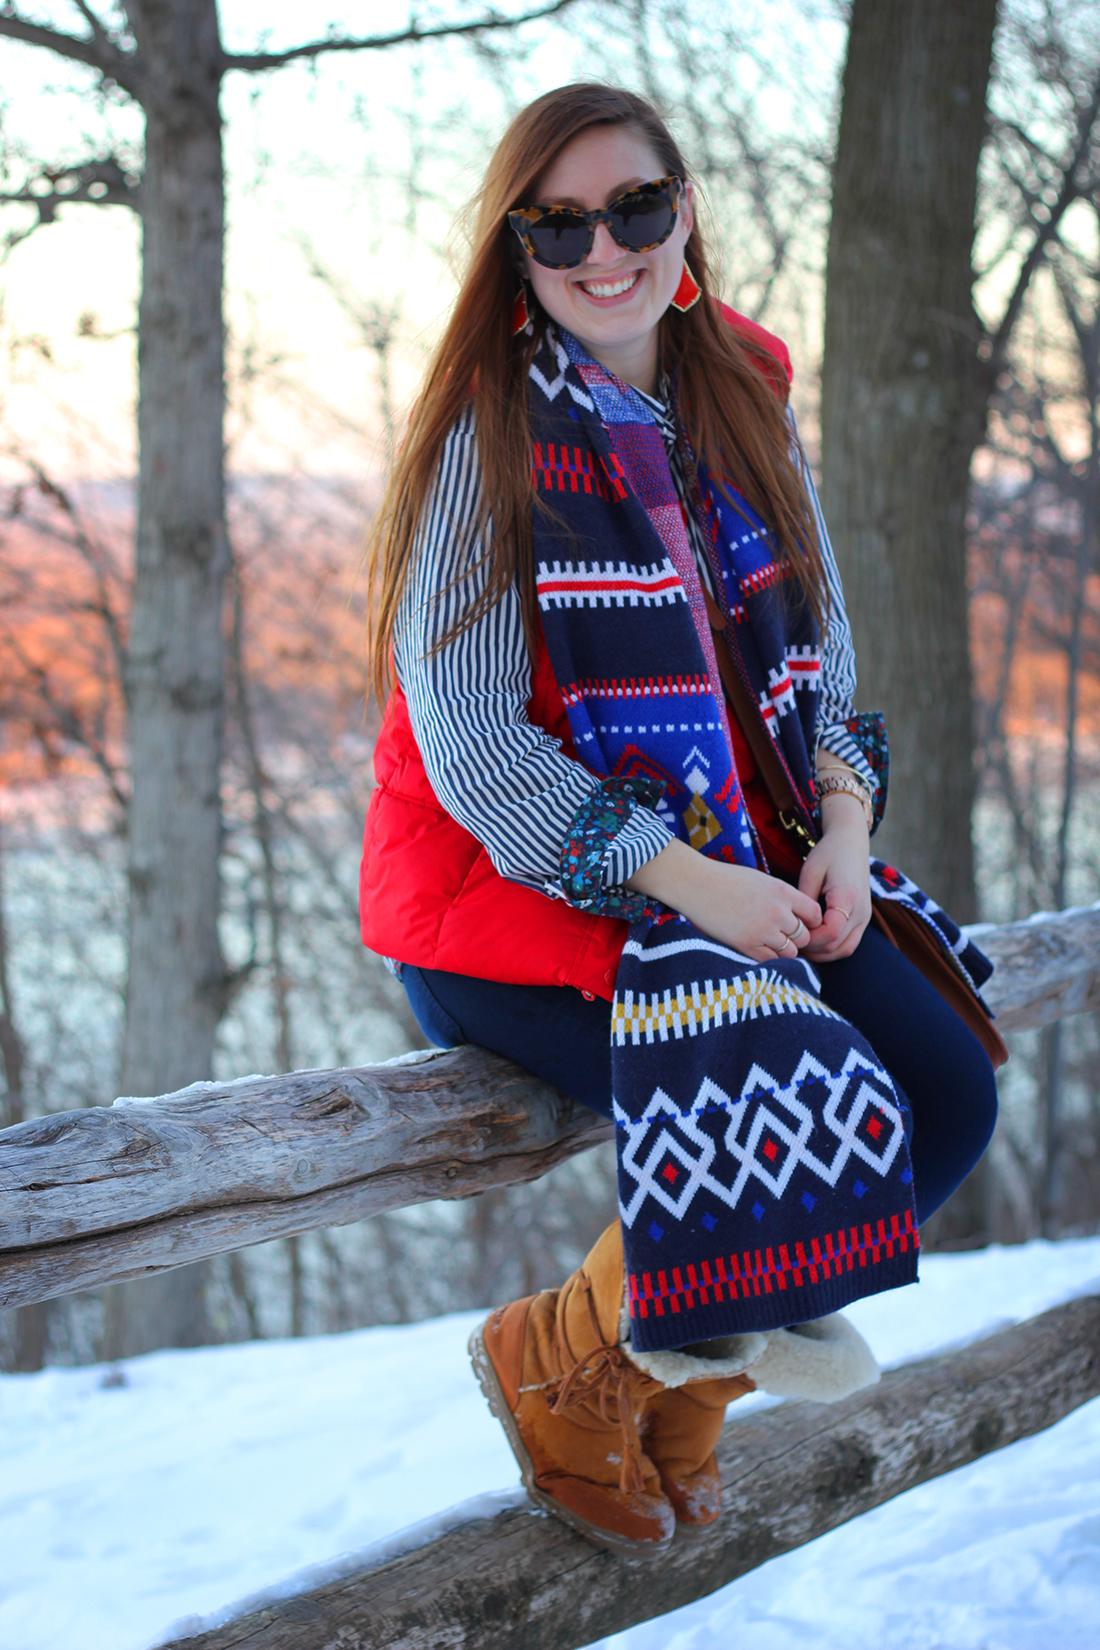 fair-isle-knit-scarf-puffy-vest-shearling-10